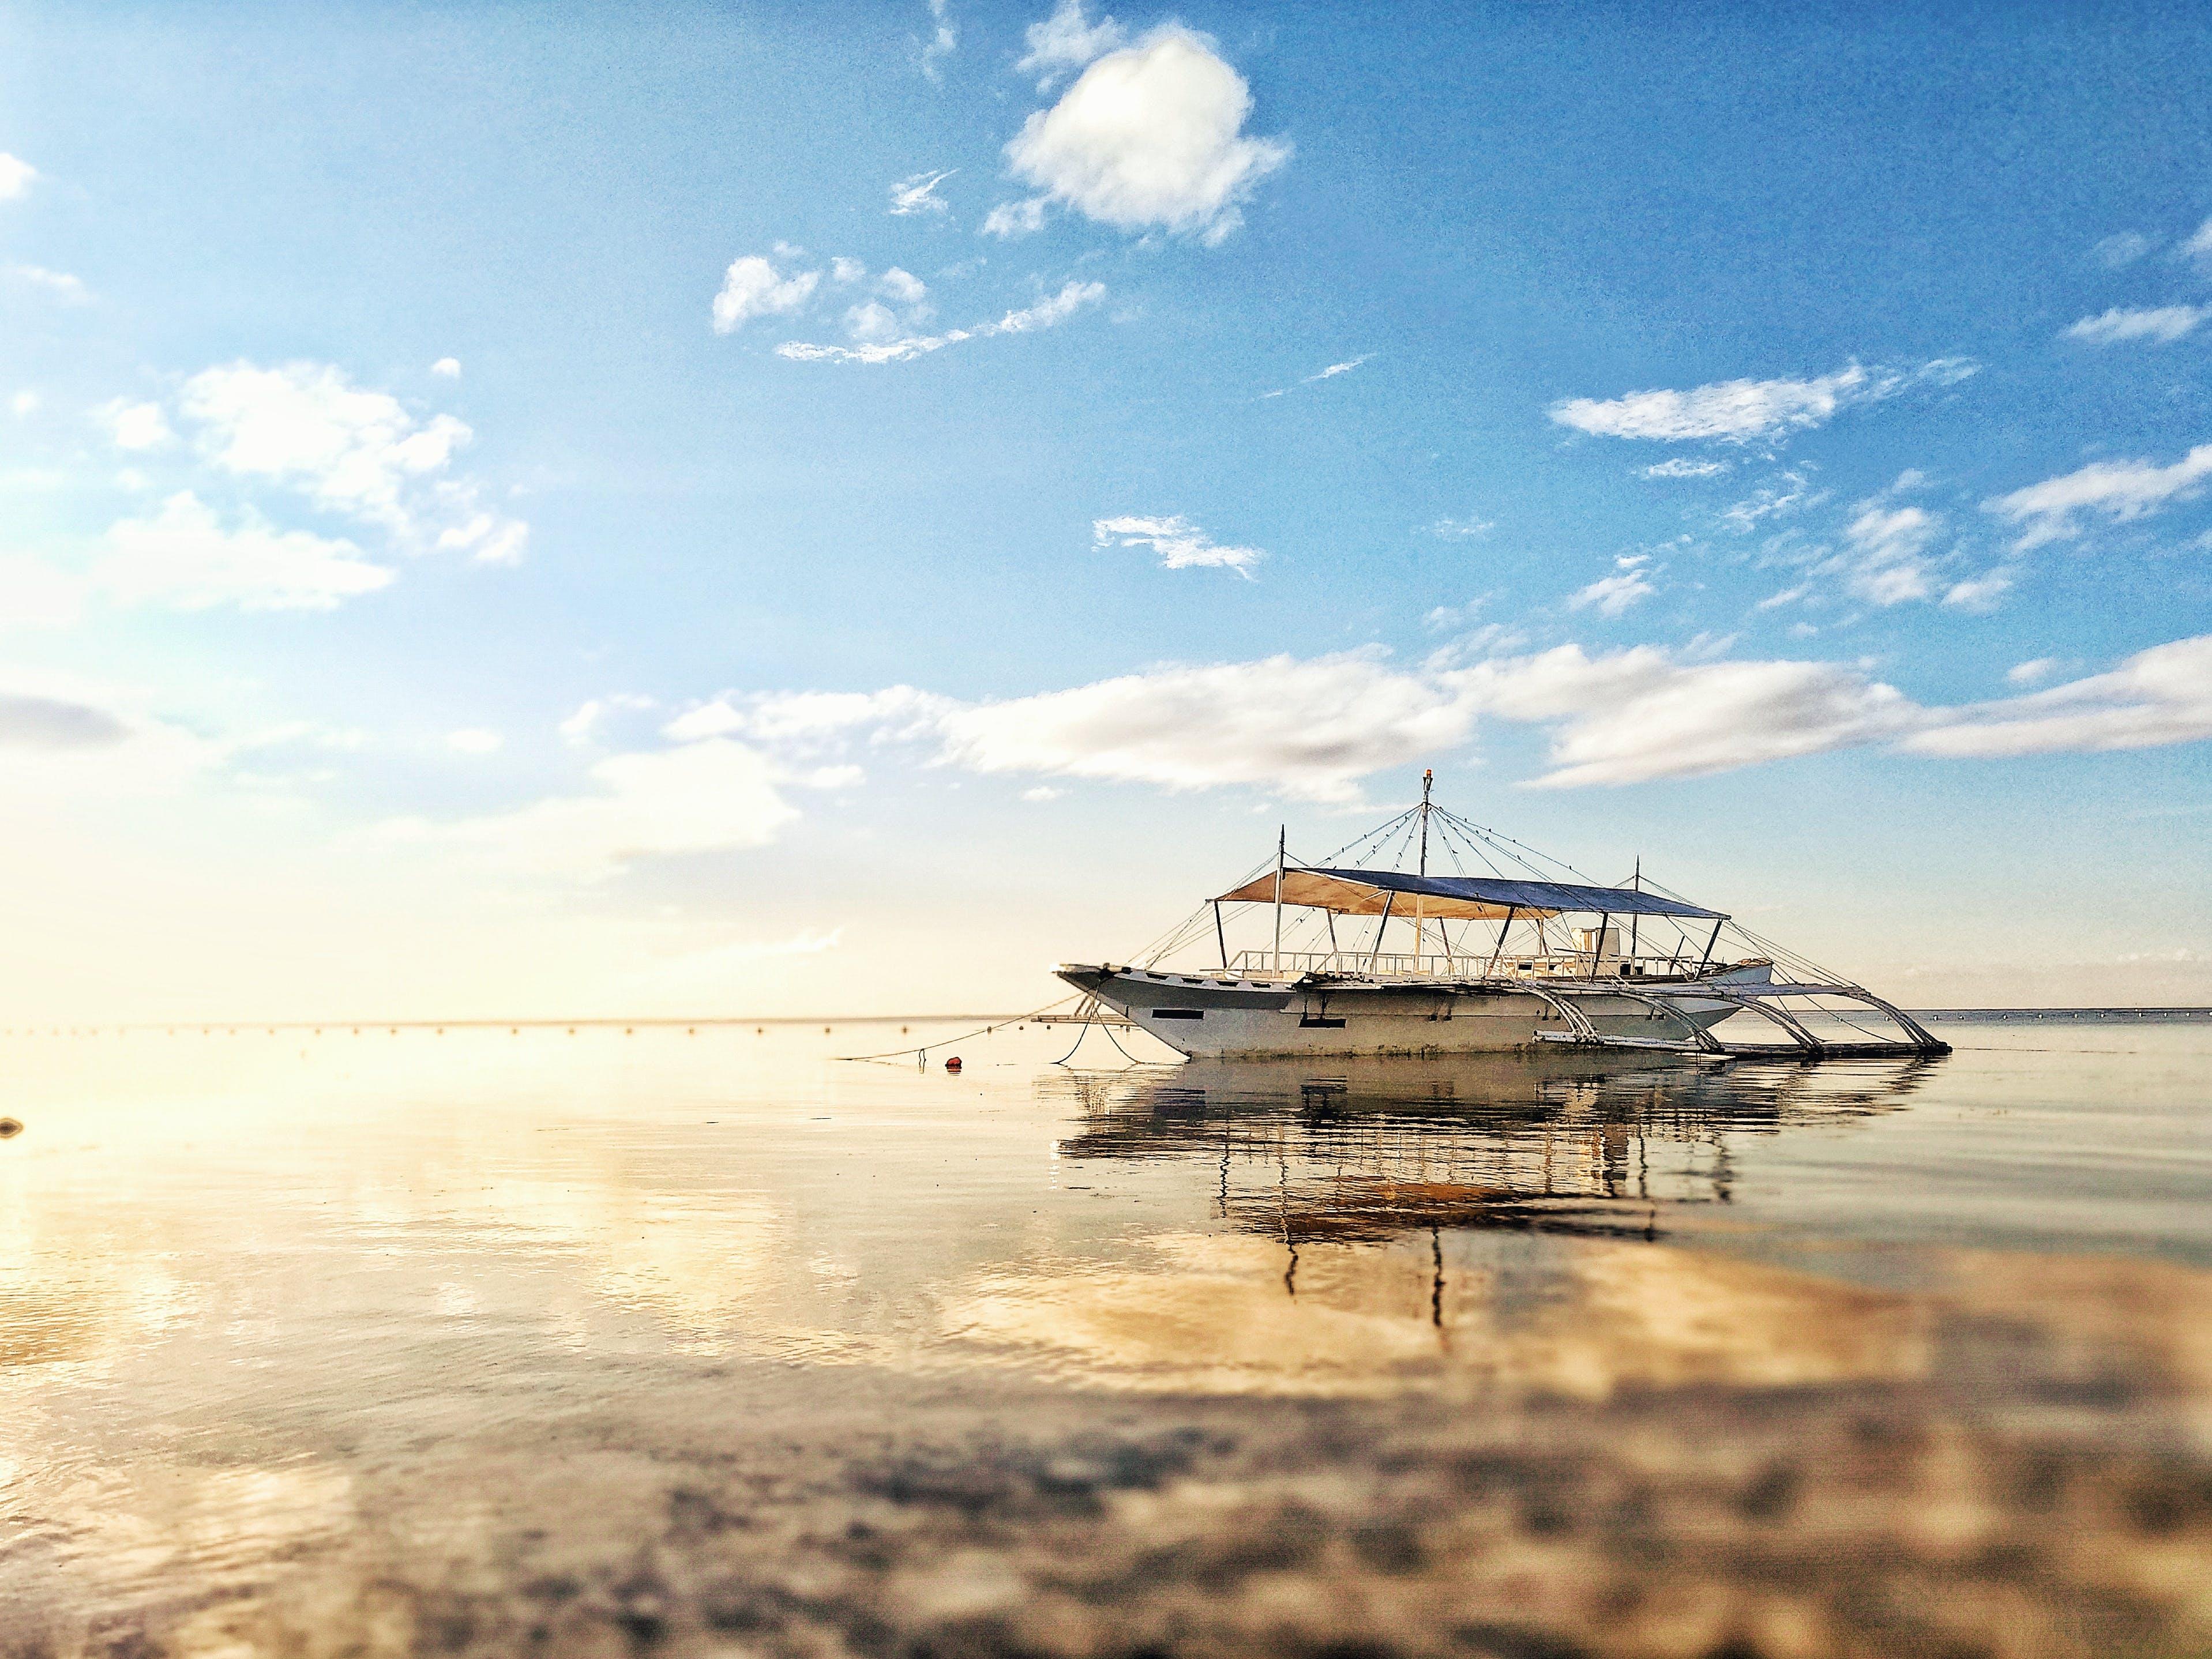 White Boat on Sea during Sunrise